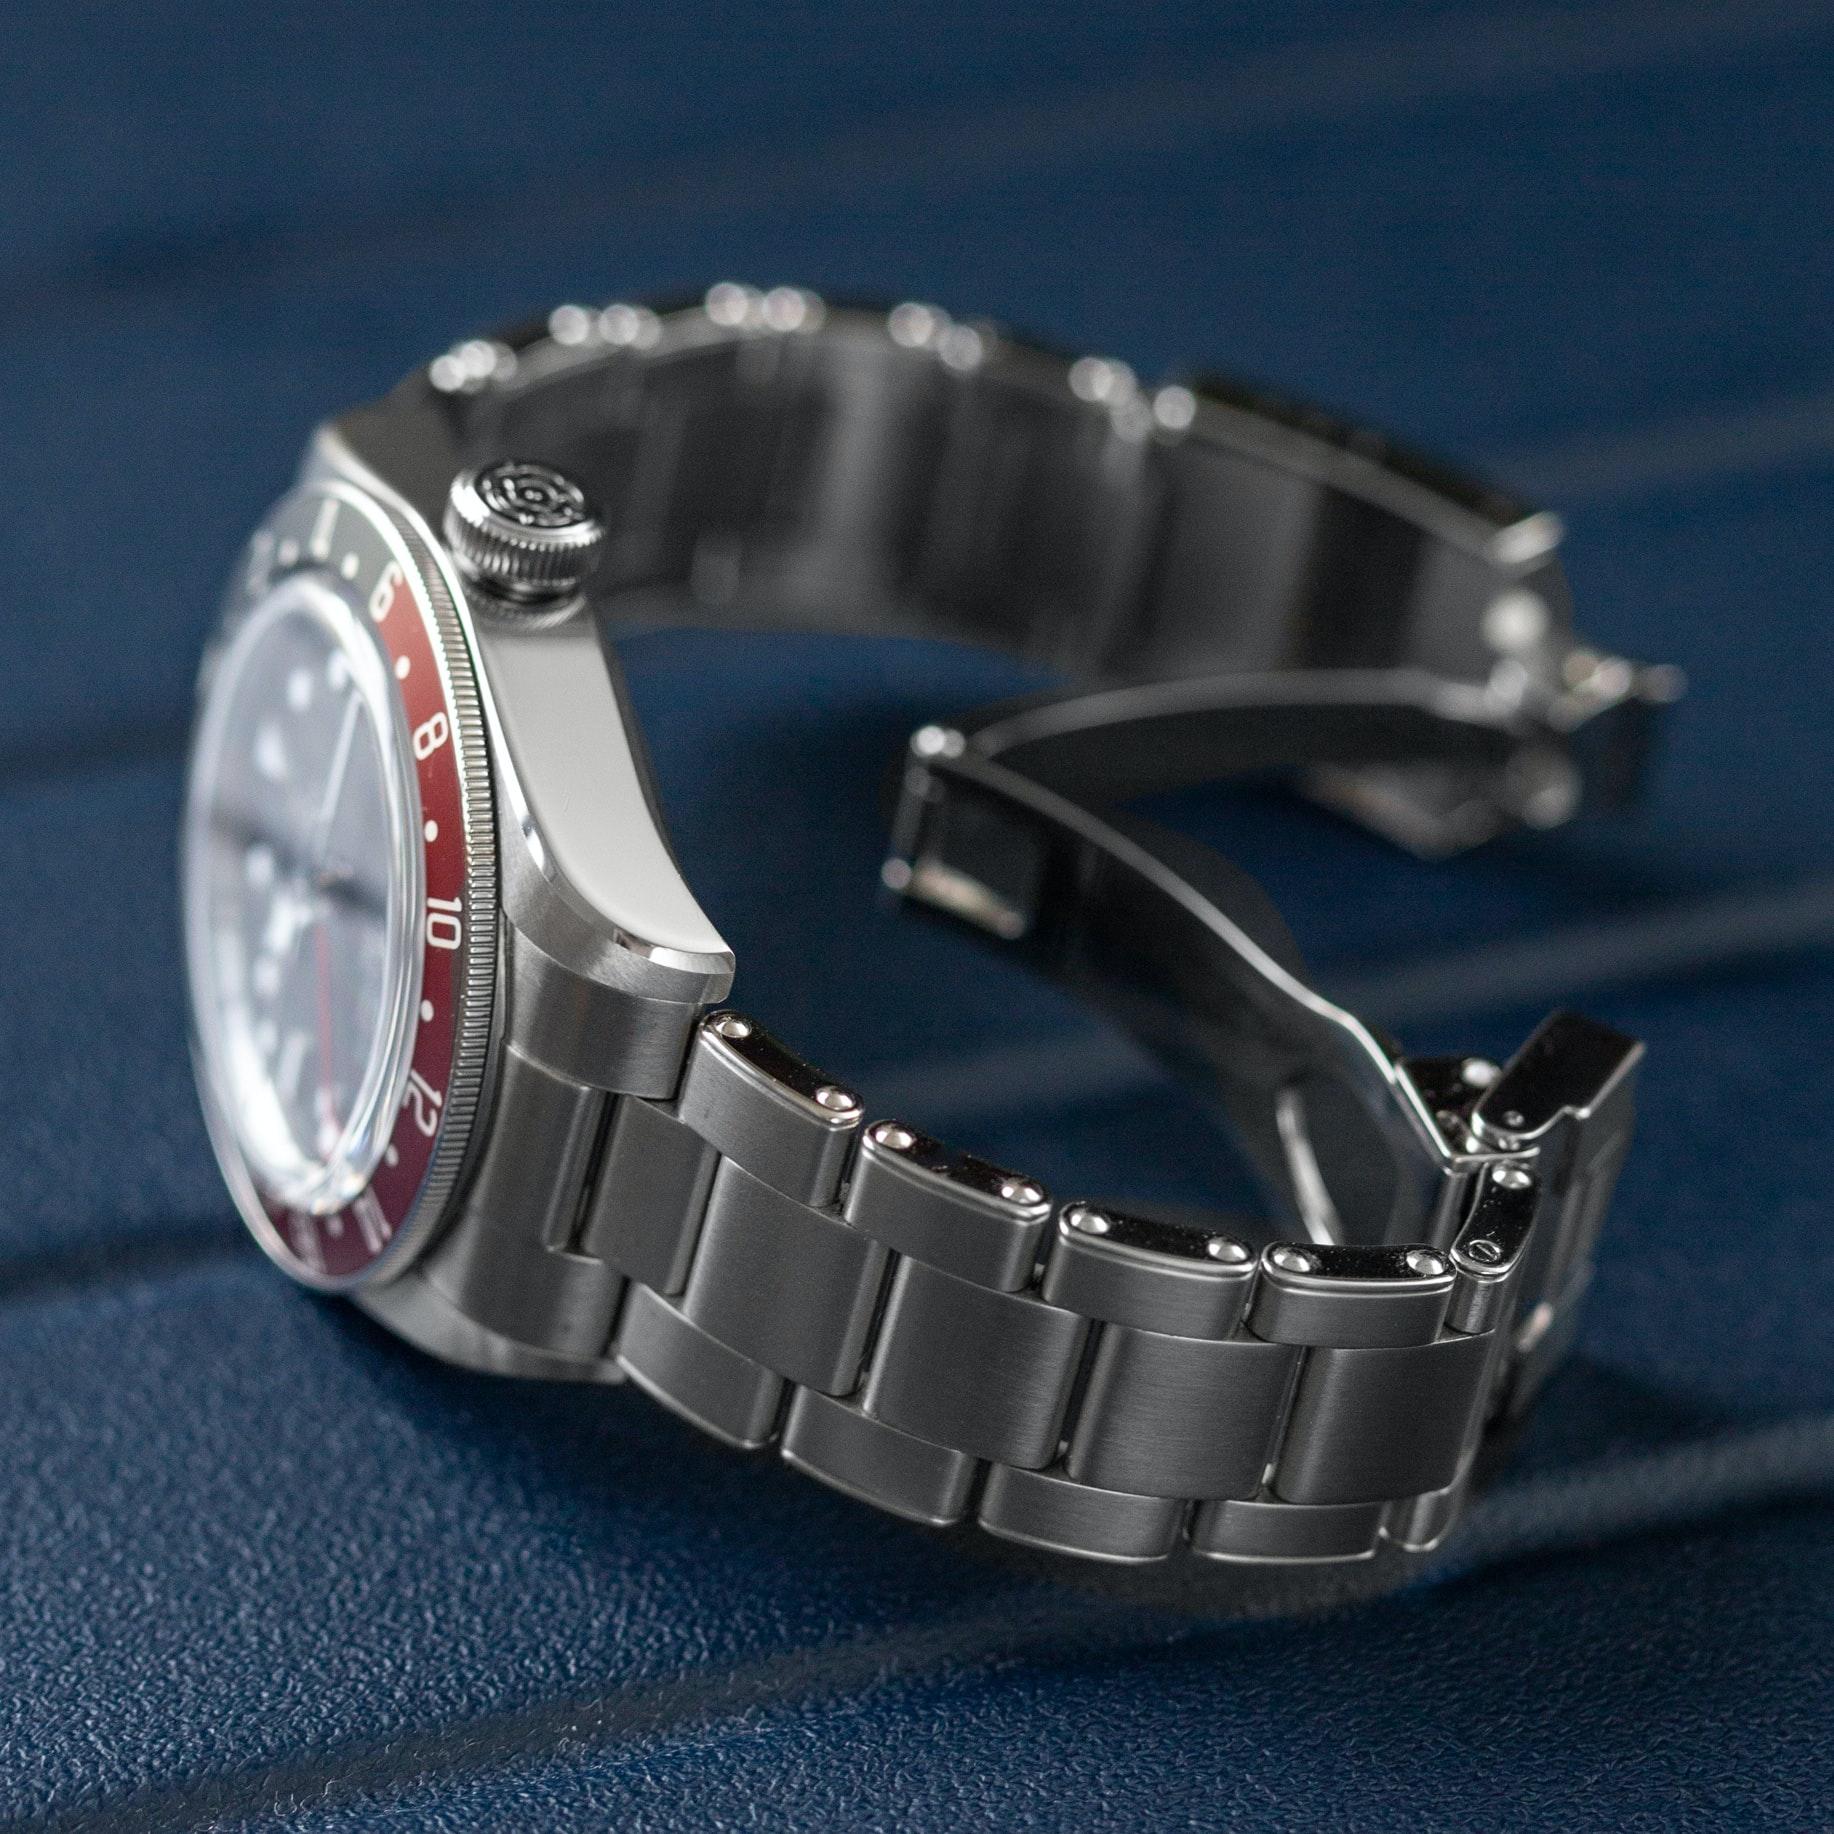 A Week On The Wrist: The Tudor Black Bay GMT Tudor Black Bay GMT 9 1